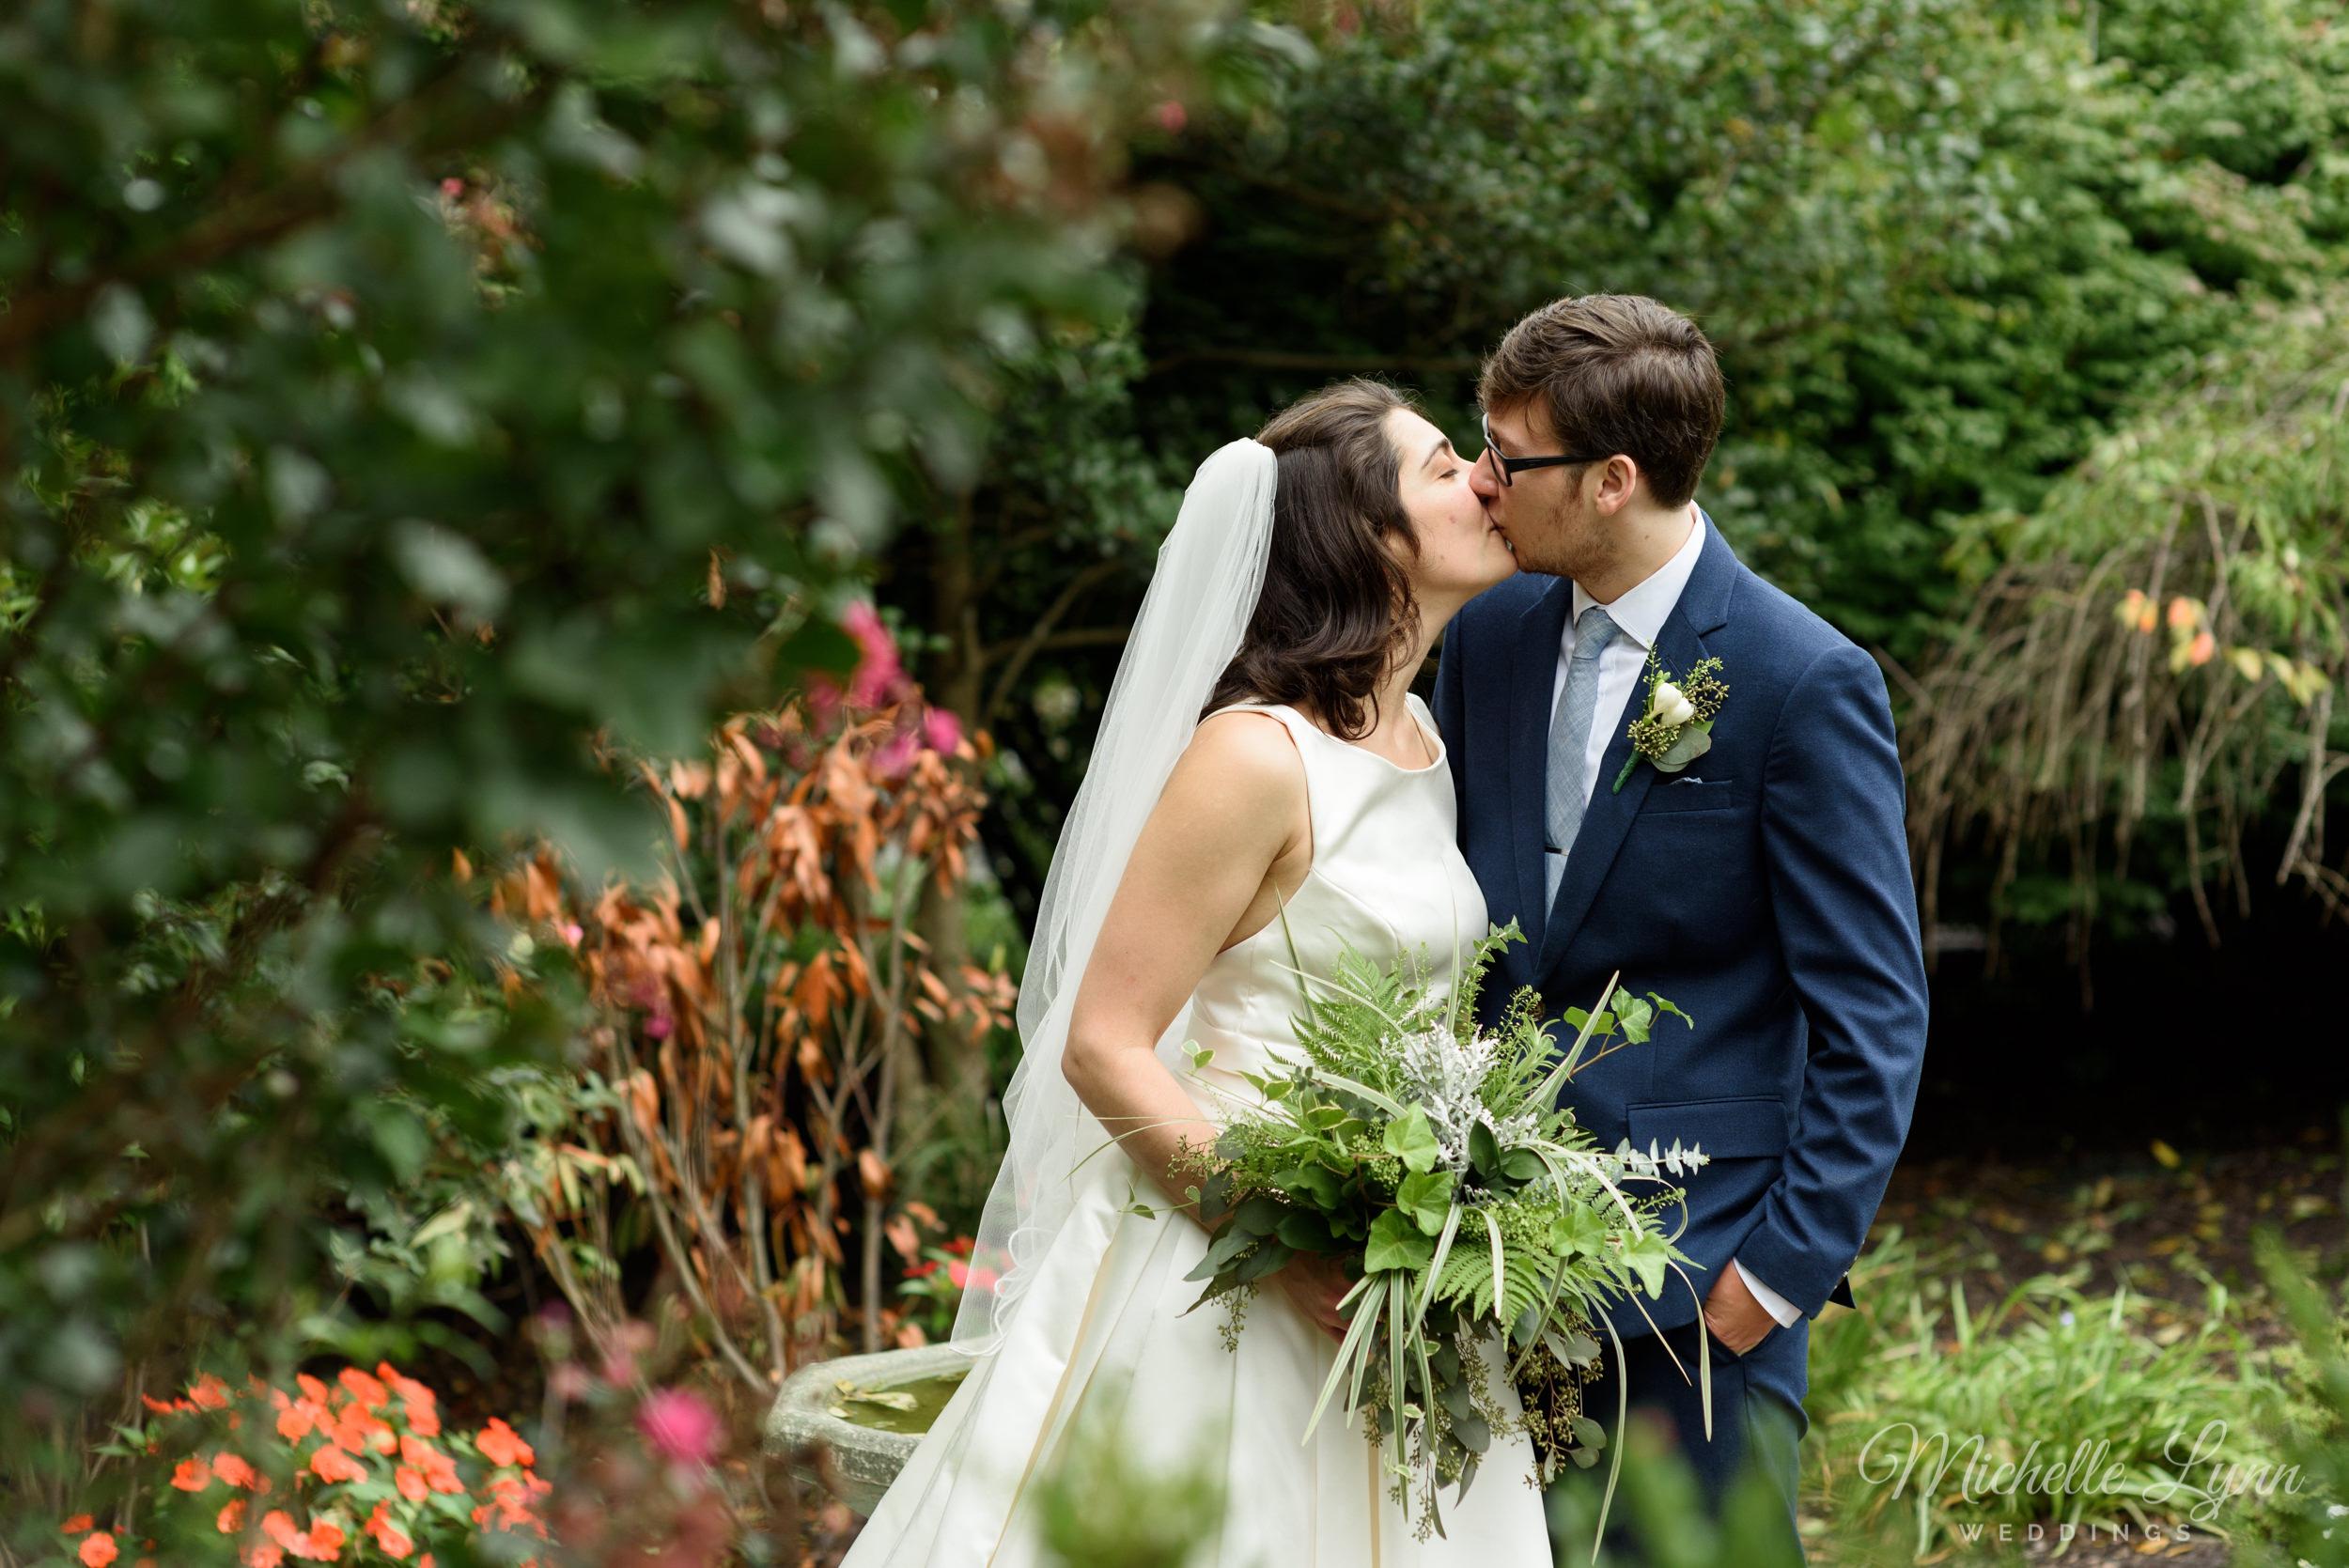 mlw-general-warren-malvern-wedding-photographer-30.jpg